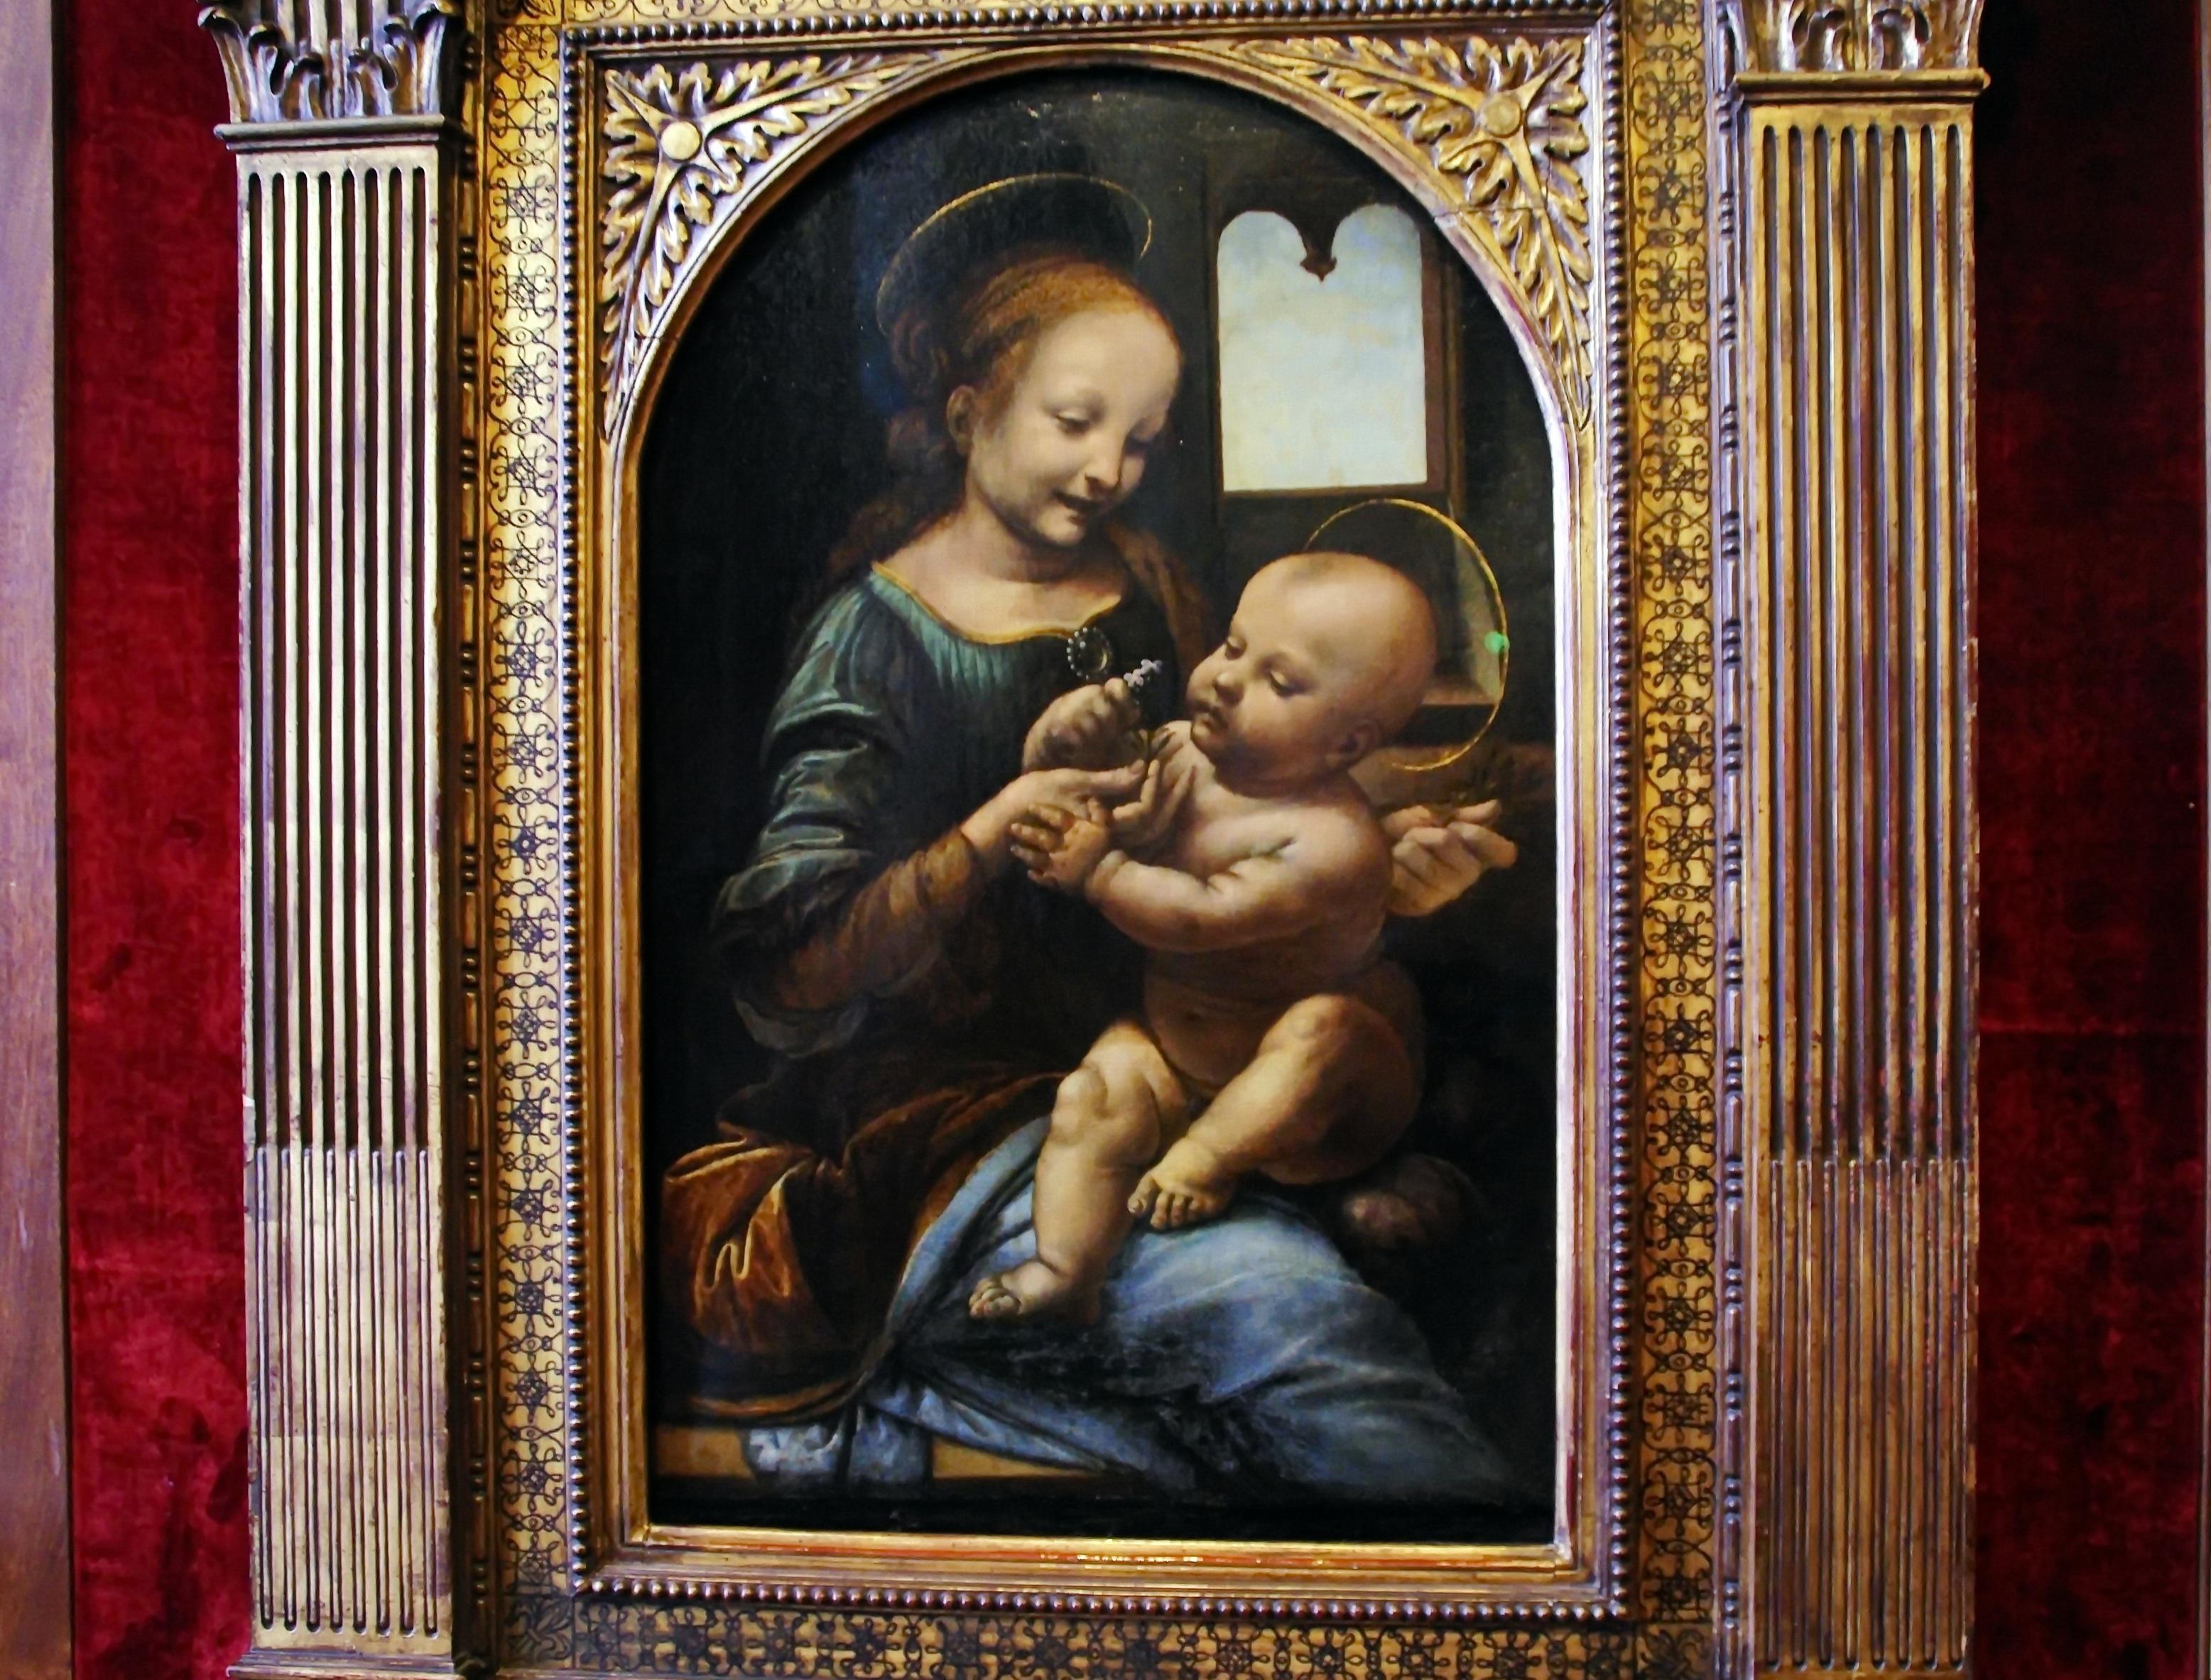 Kostenlose foto : Tabelle, Fenster, Museum, Malerei, Altar ...